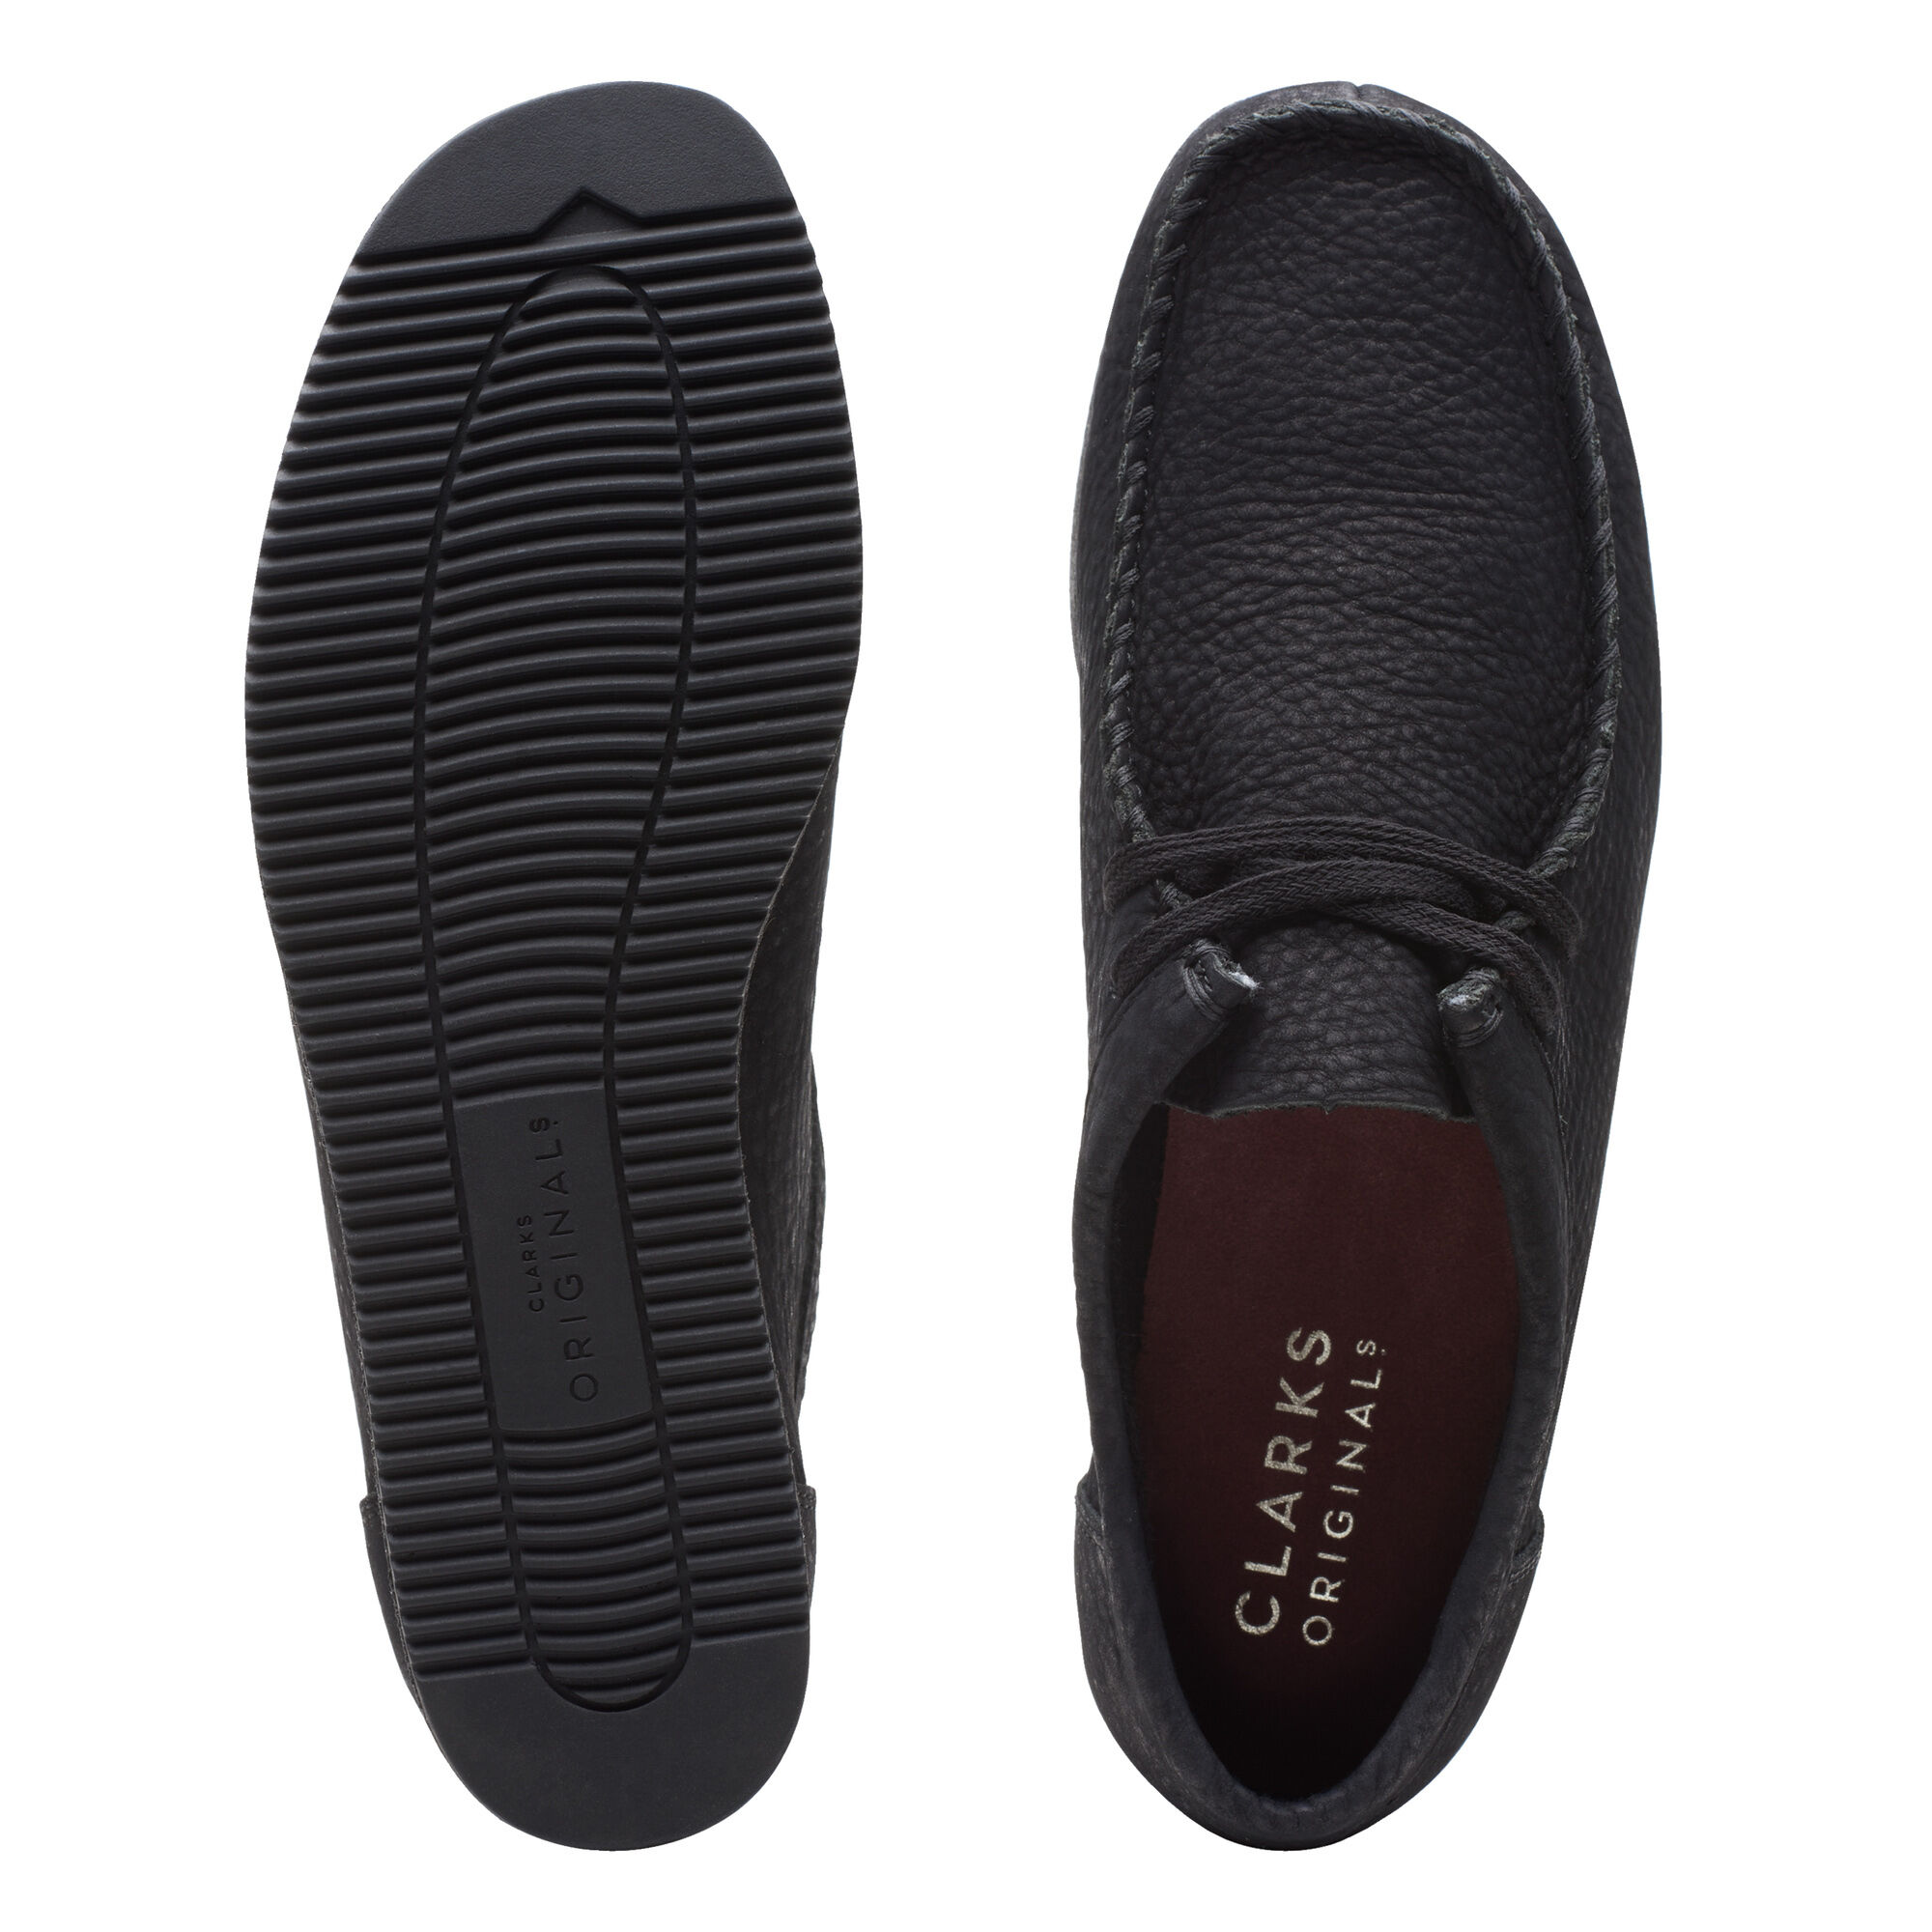 Women's Black Nubuck Sandals Wallacraft Lo | Clarks